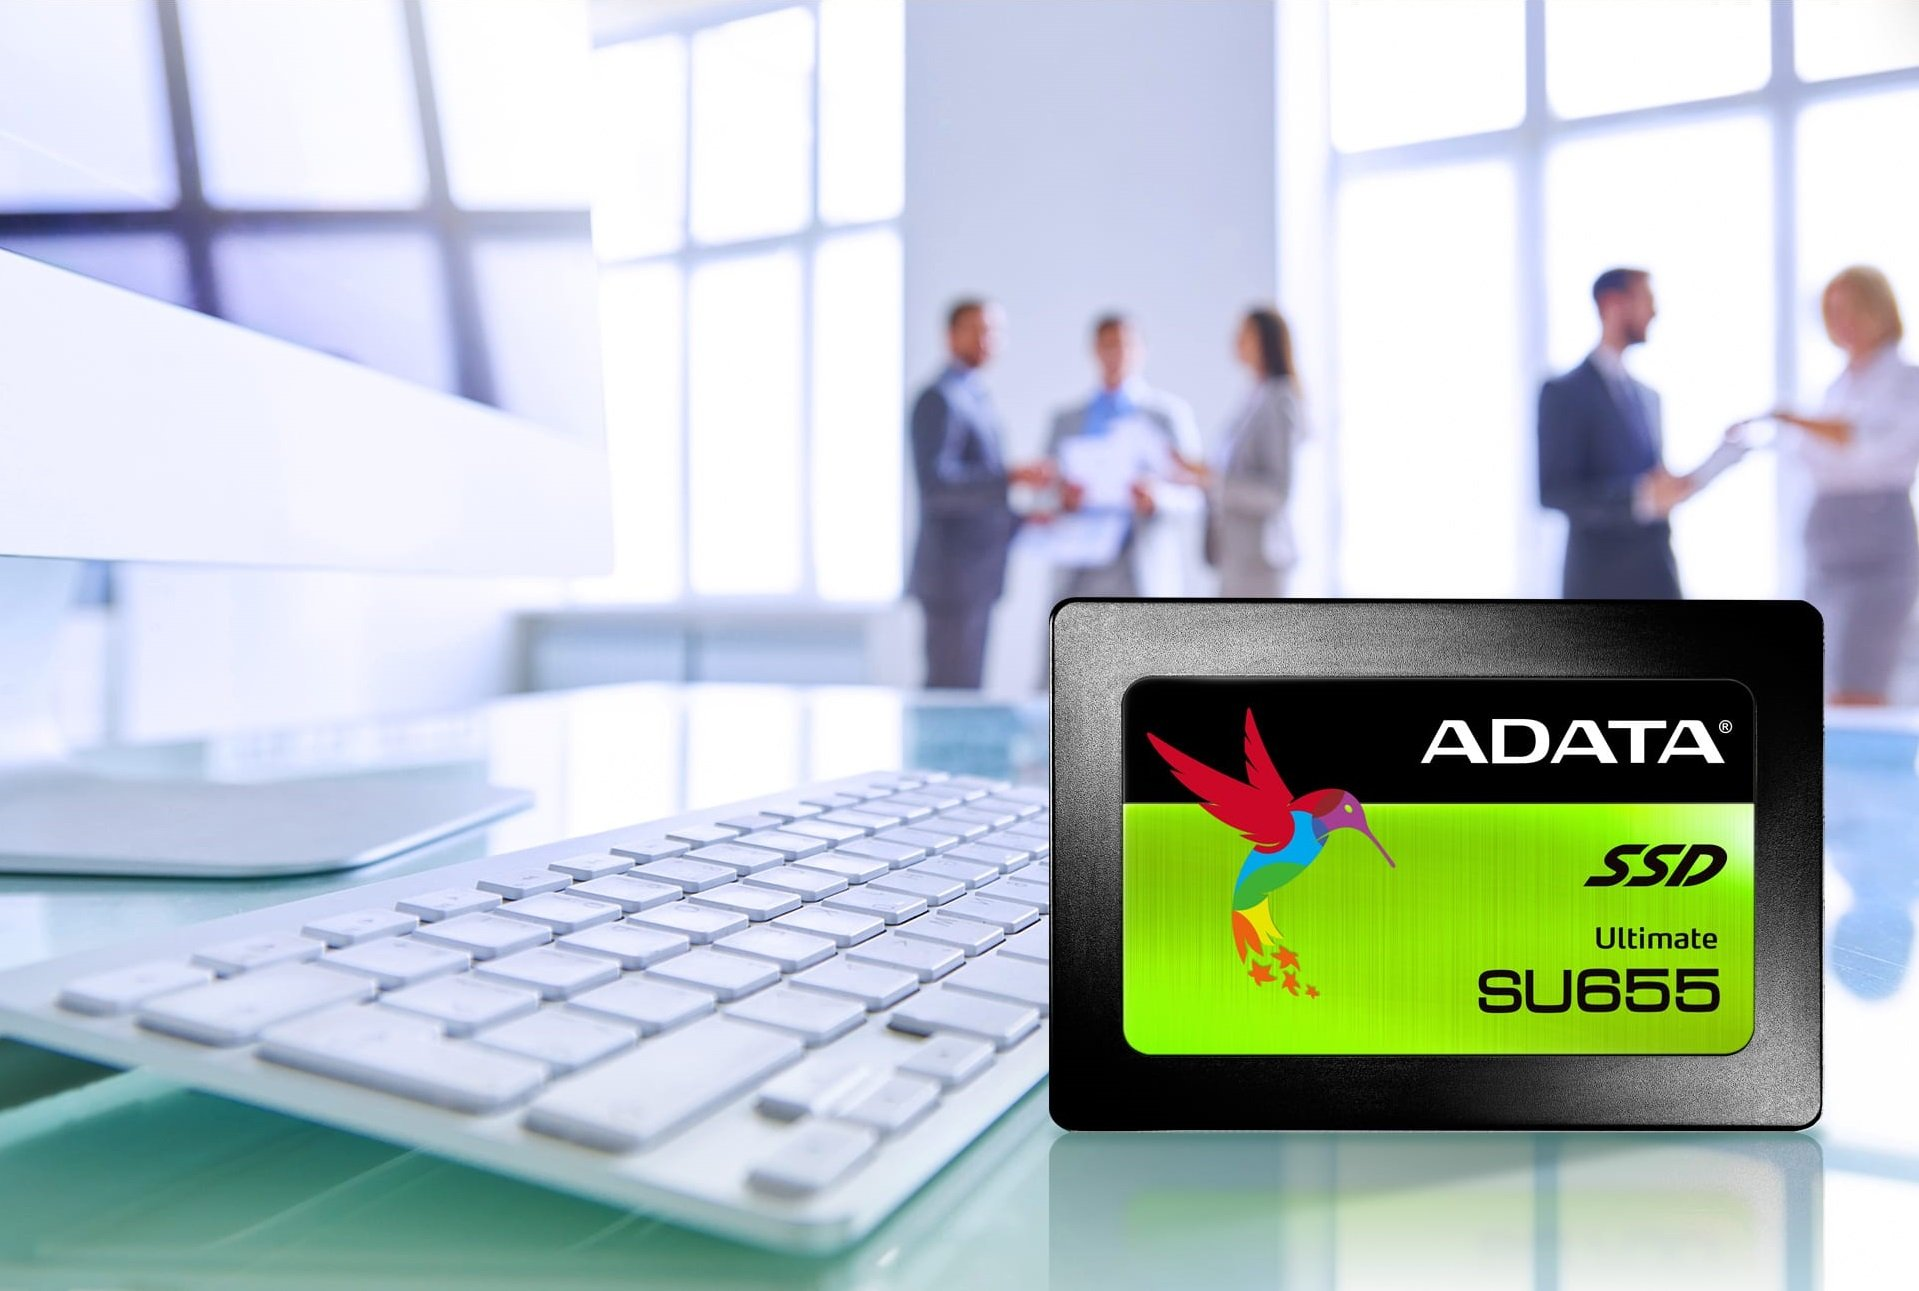 ADATA SU655 240GB 3D NAND 2.5 inch SATA III High Speed Read up to 520MB/s Internal SSD (ASU655SS-240GT-C) by ADATA (Image #6)